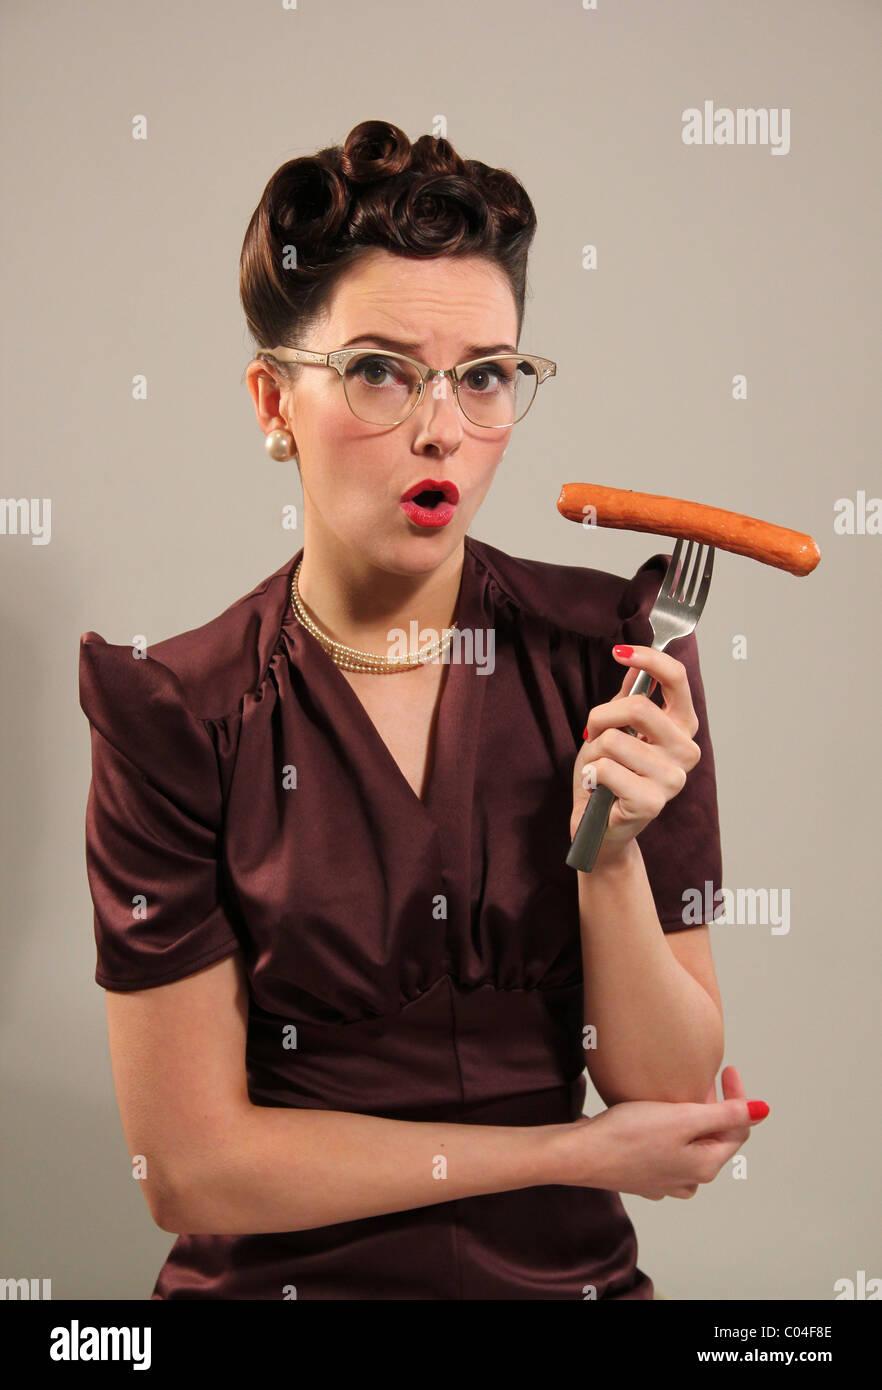 Retro woman holding a sausage - Stock Image